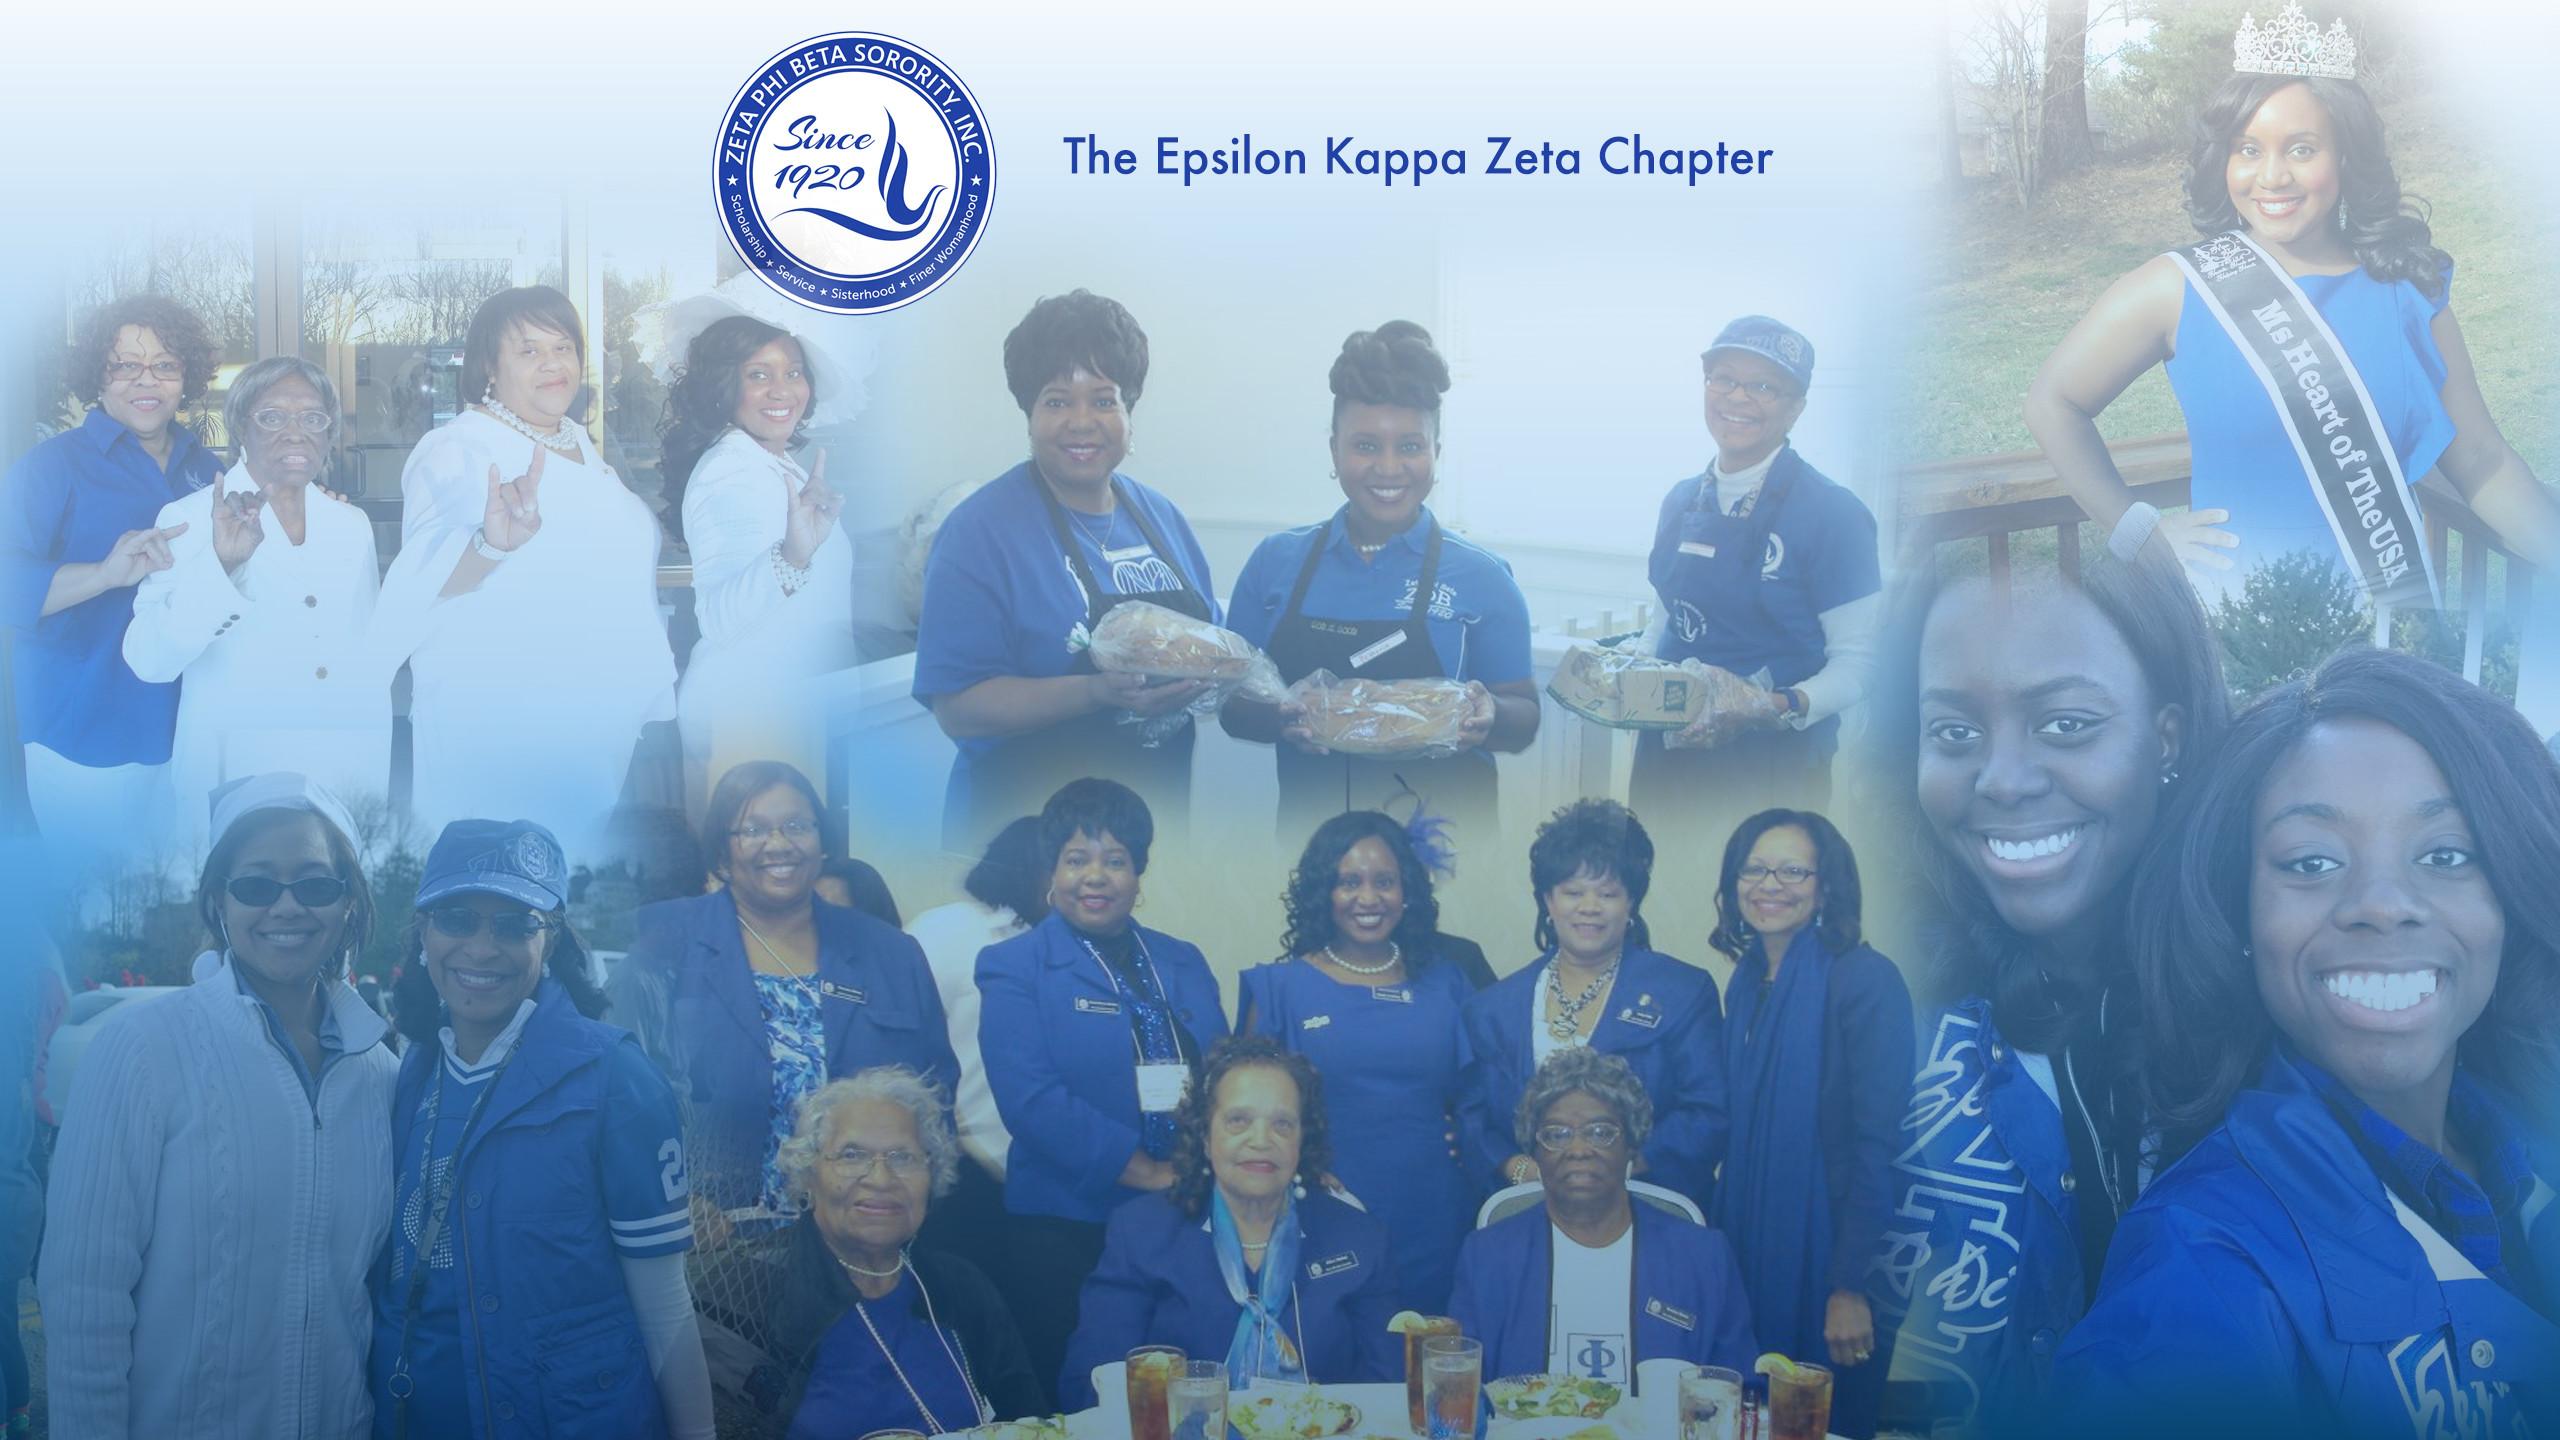 Epsilon Kappa Zeta Chapter of Zeta Phi Beta Sorority Inc. – Scholarship,  Sisterly Love, Service, Finer Womanhood